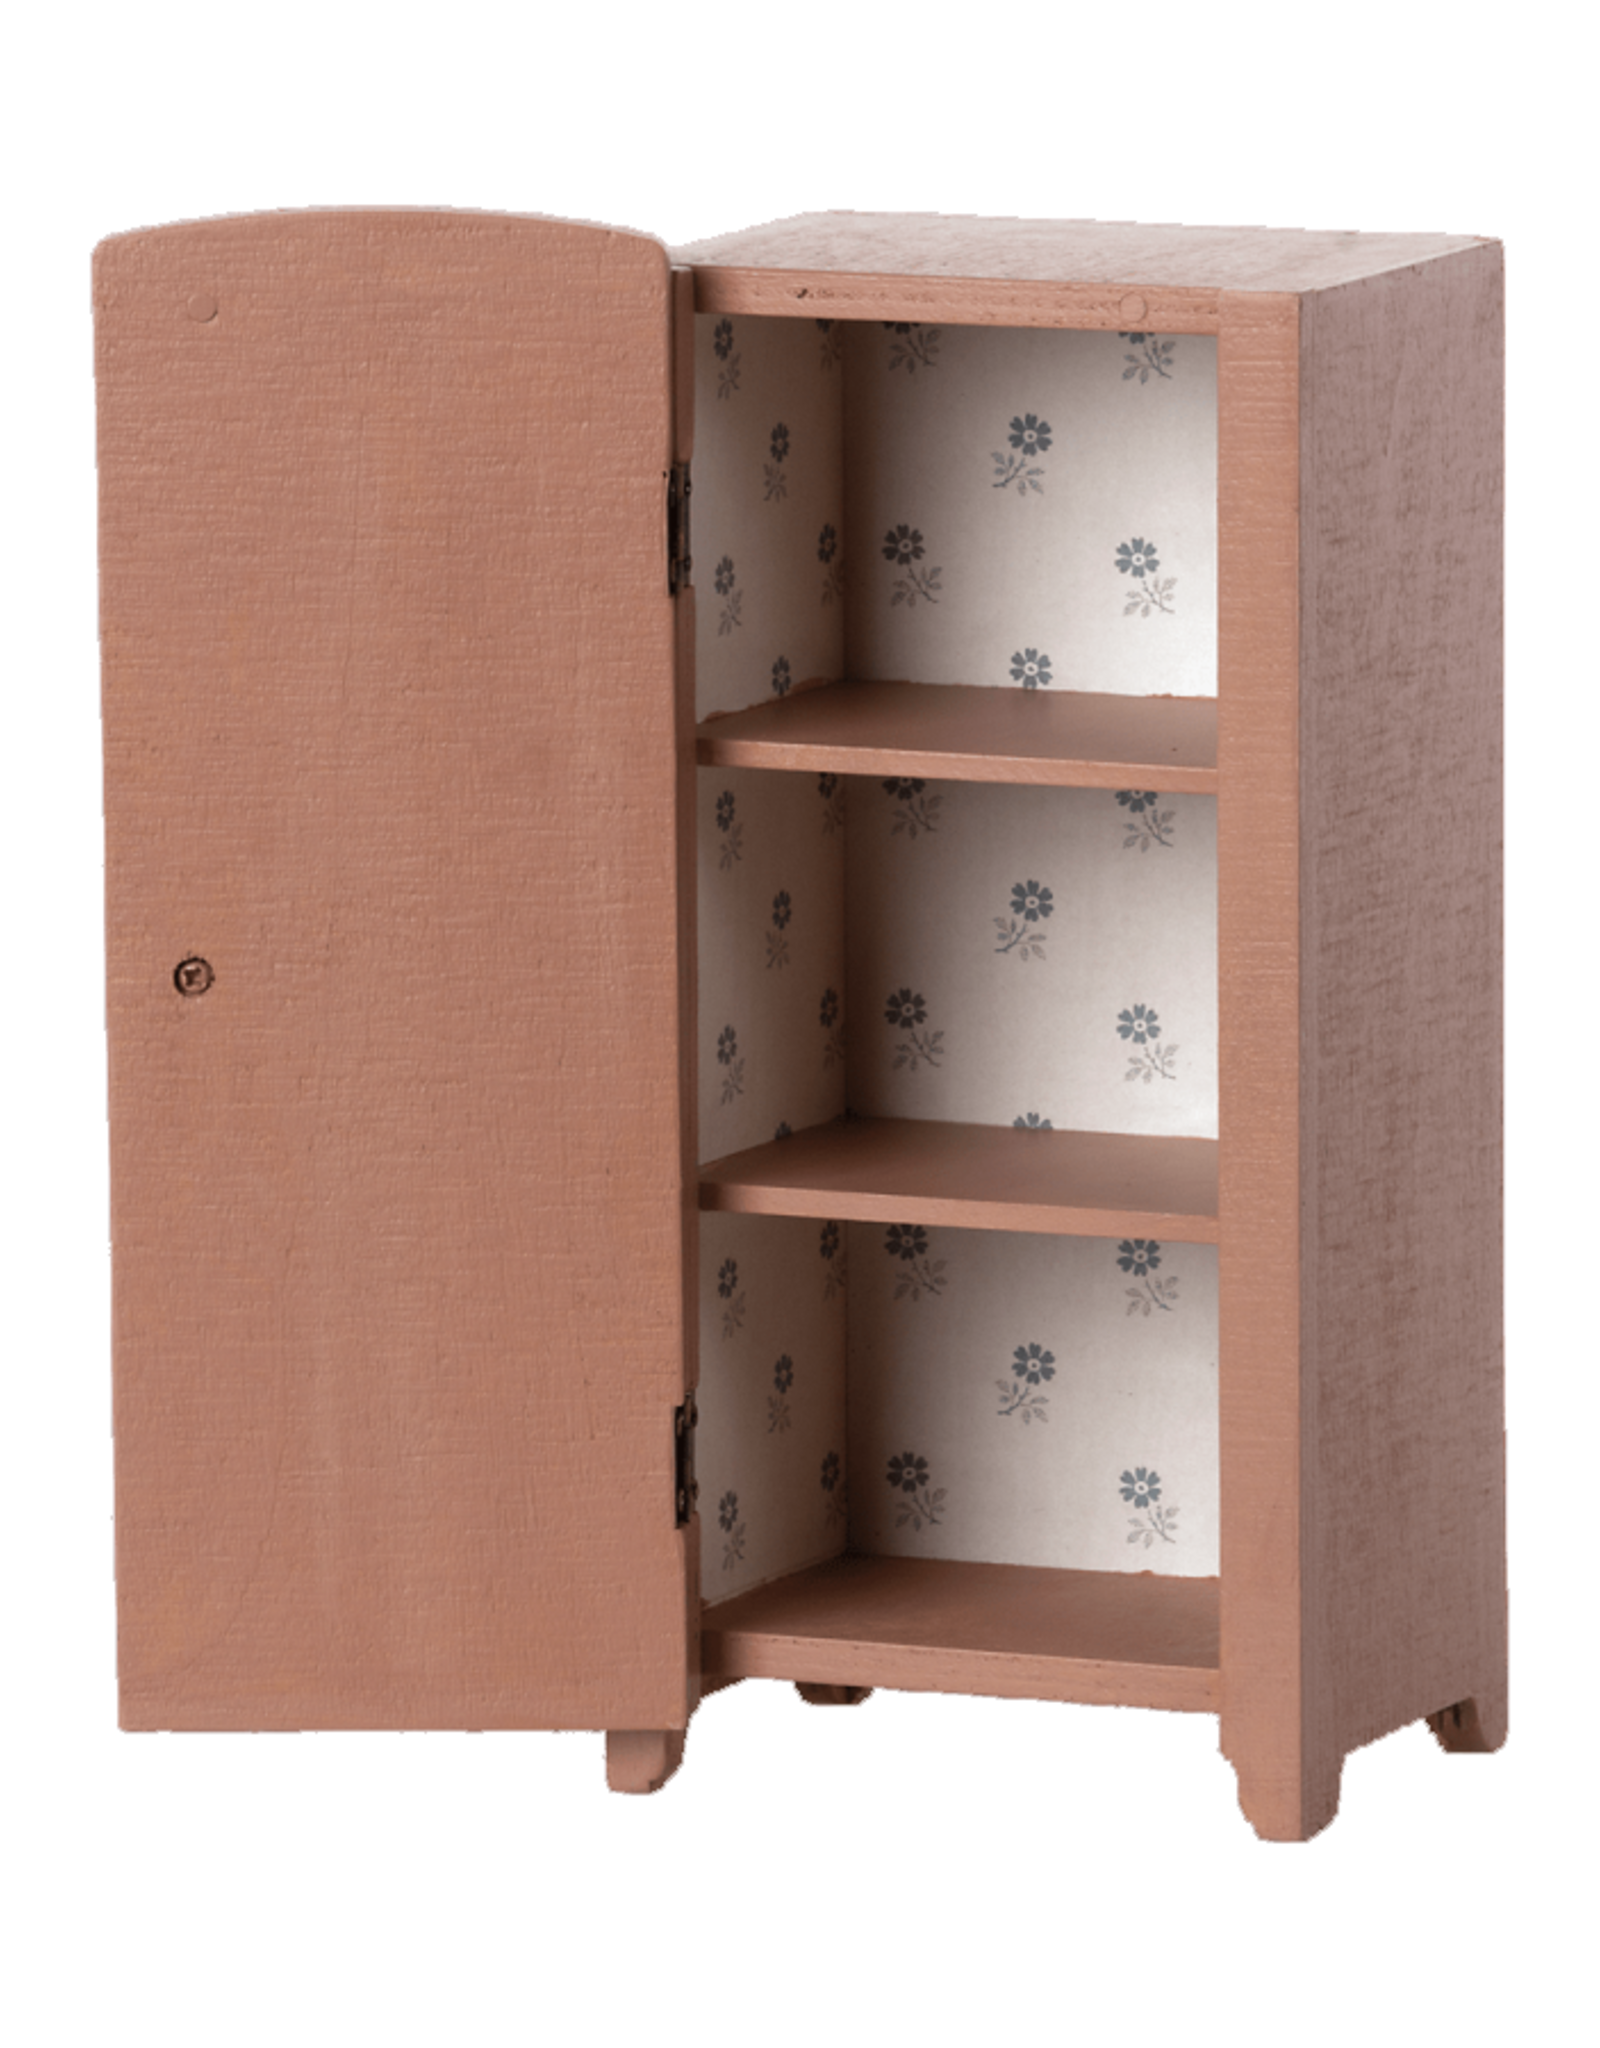 Maileg Miniature Closet - Dusty Rose